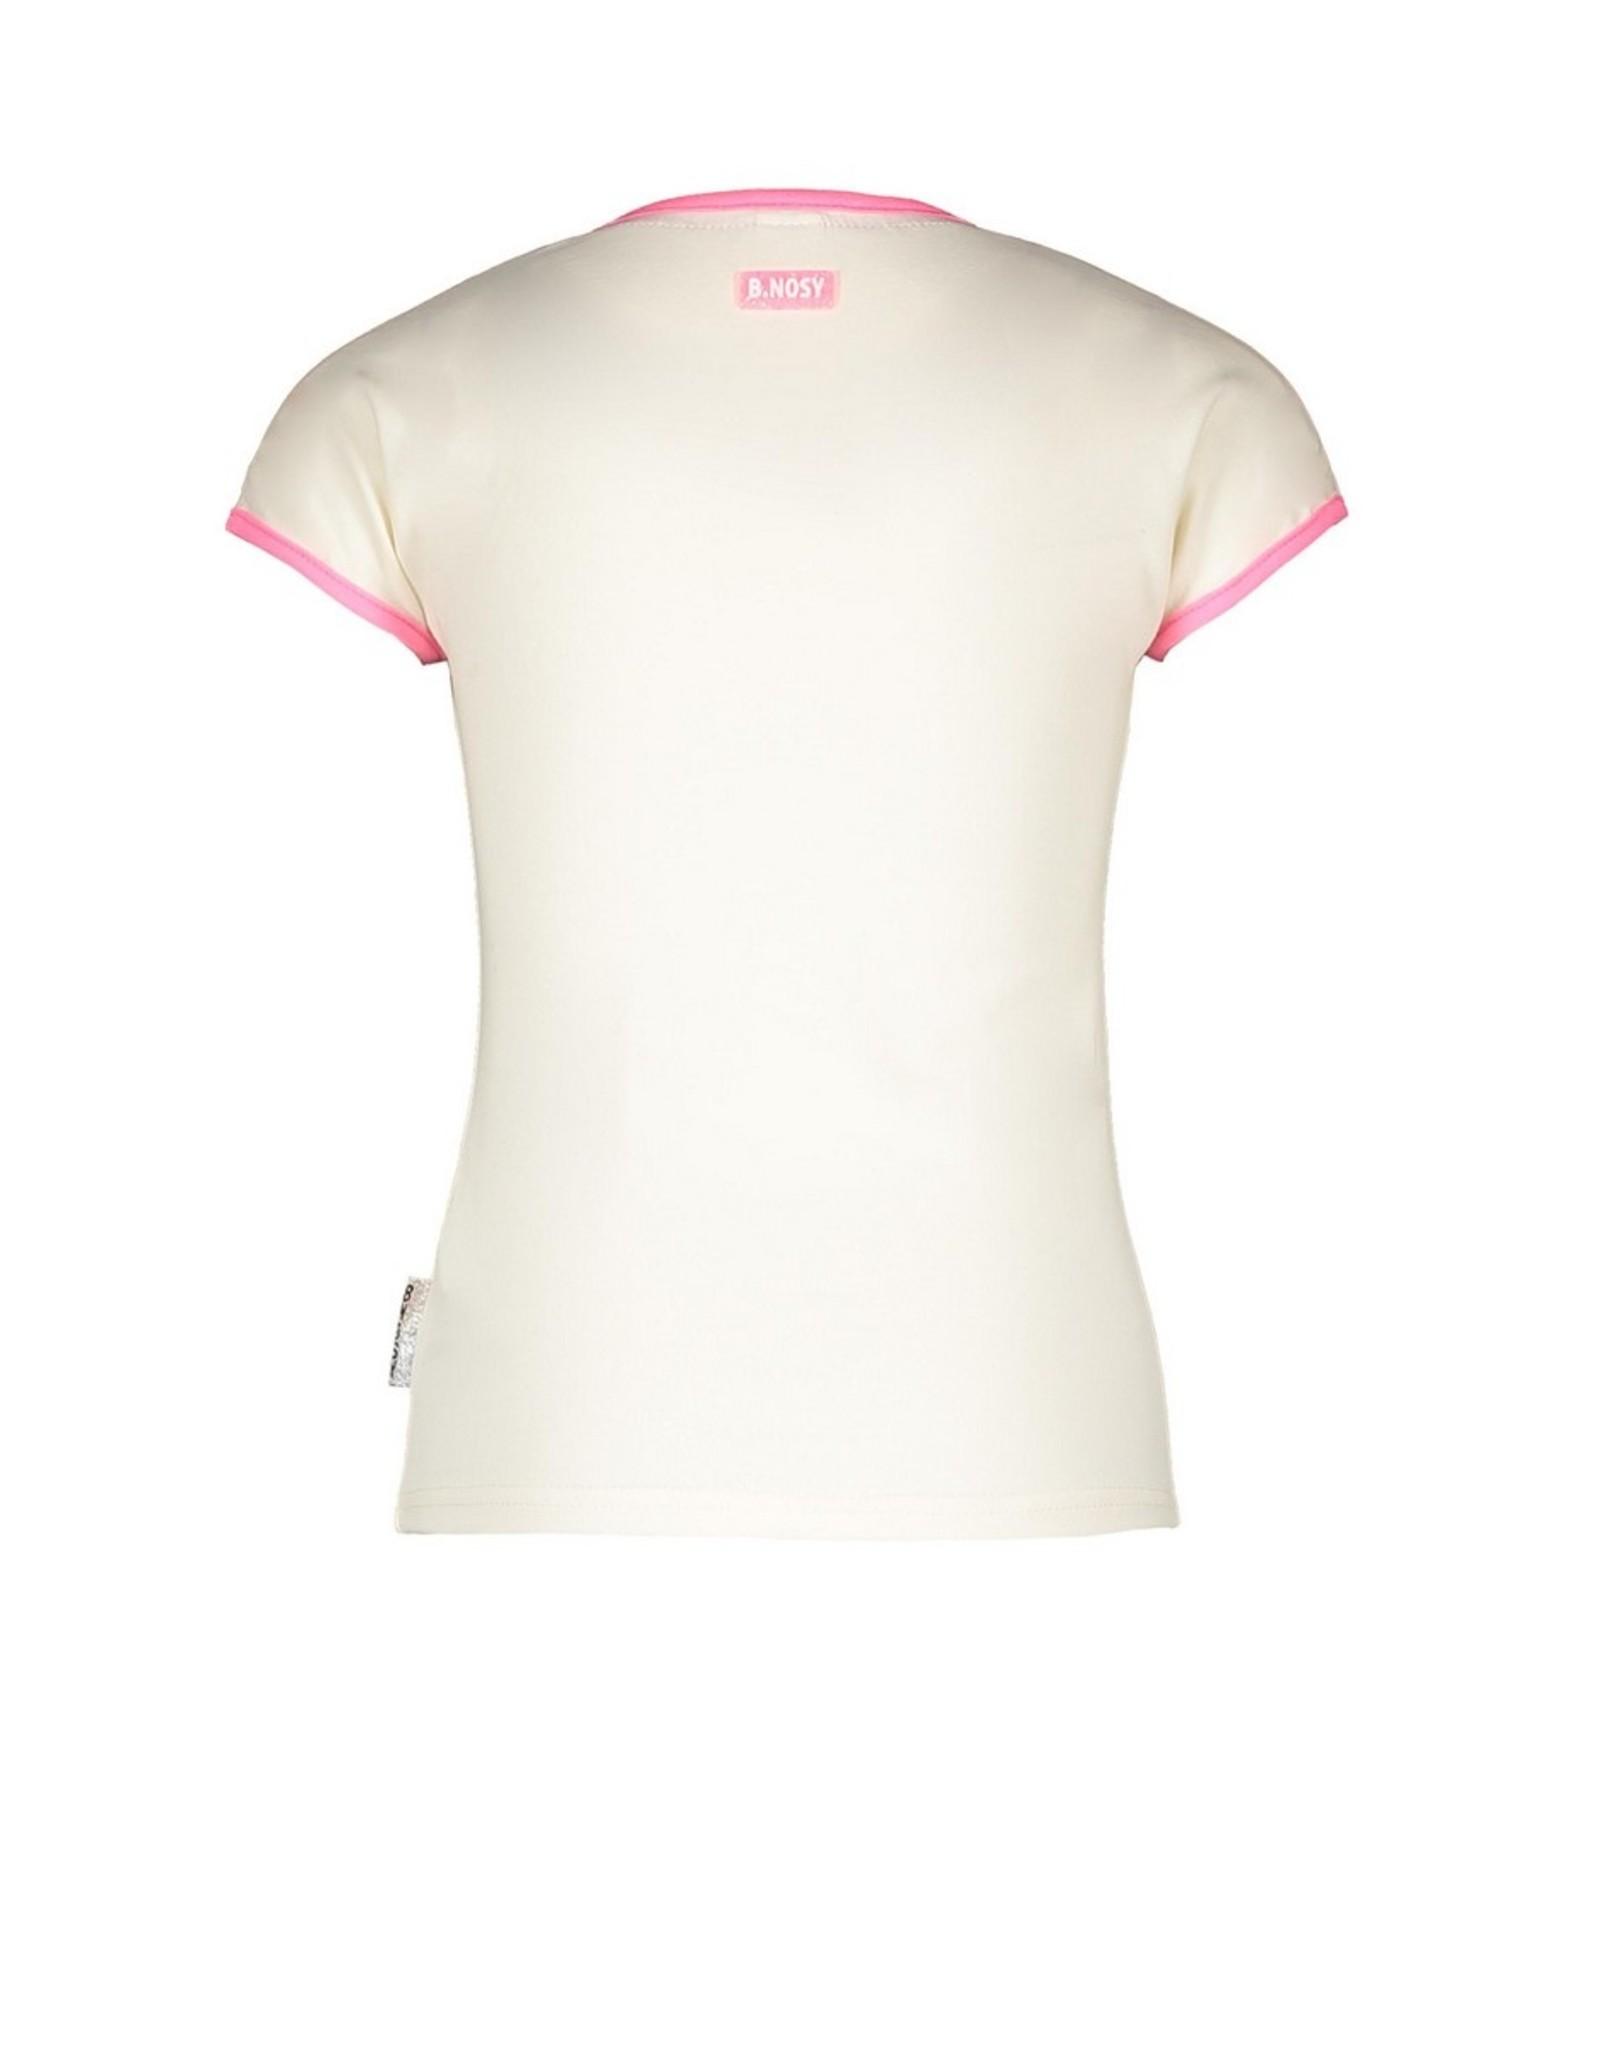 B.Nosy B.Nosy Girls T-shirt With Fancy Artwork Cotton